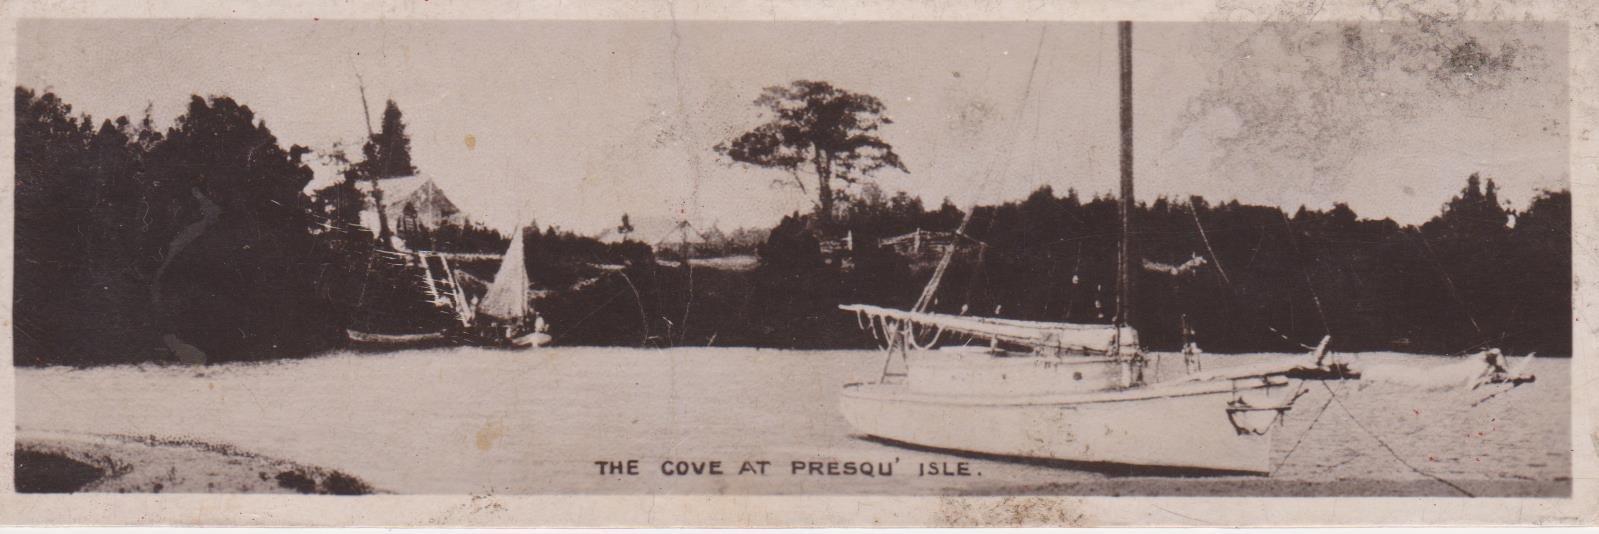 Book postcard of The Cove at Presqu'isle